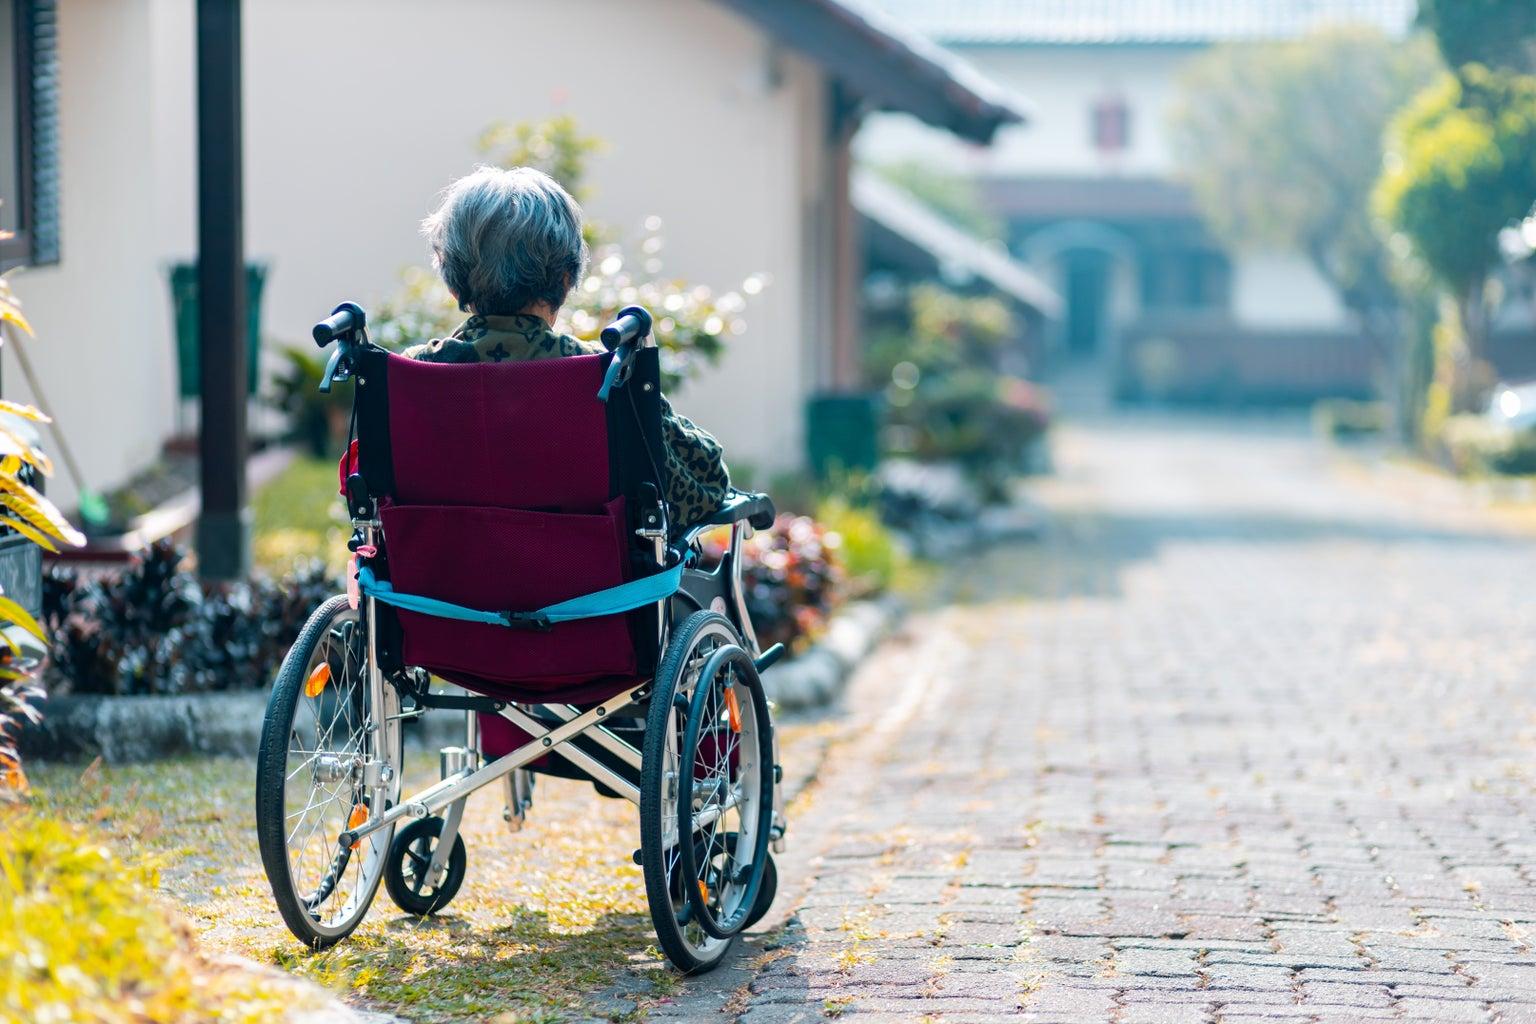 Woman in wheelchair in front of neighborhood